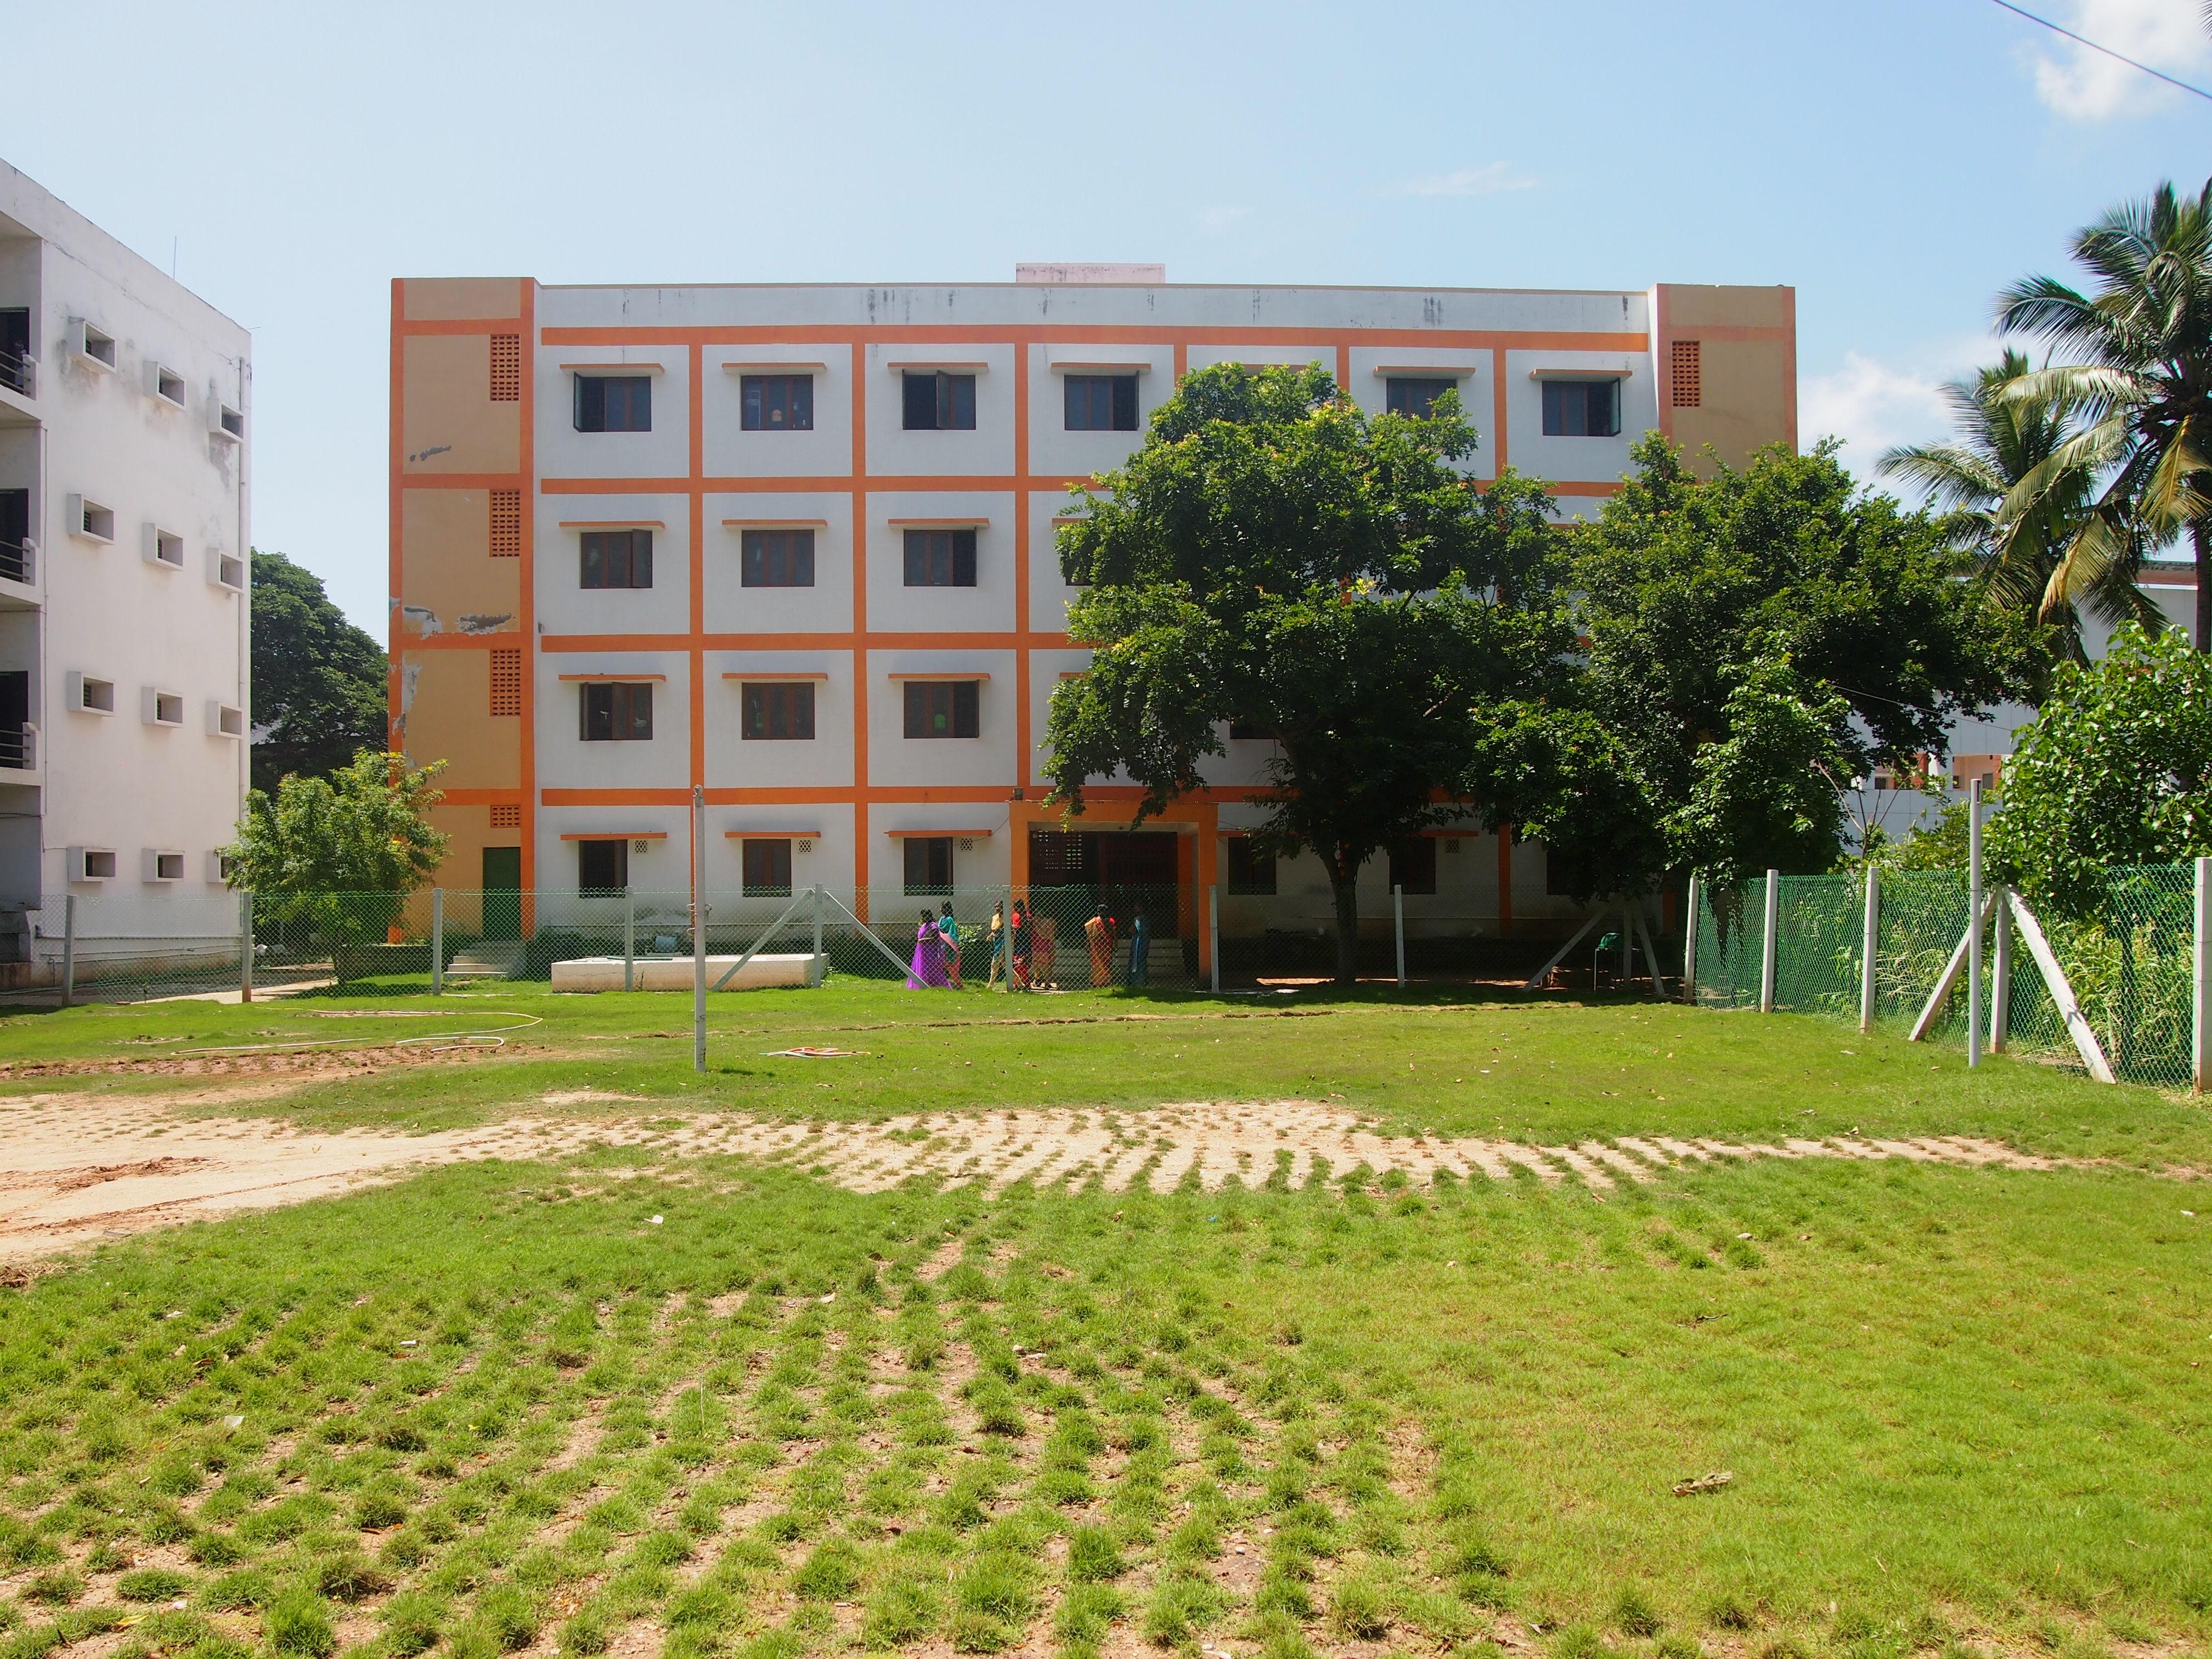 JK College of Nursing and Paramedicals, Coimbatore Image